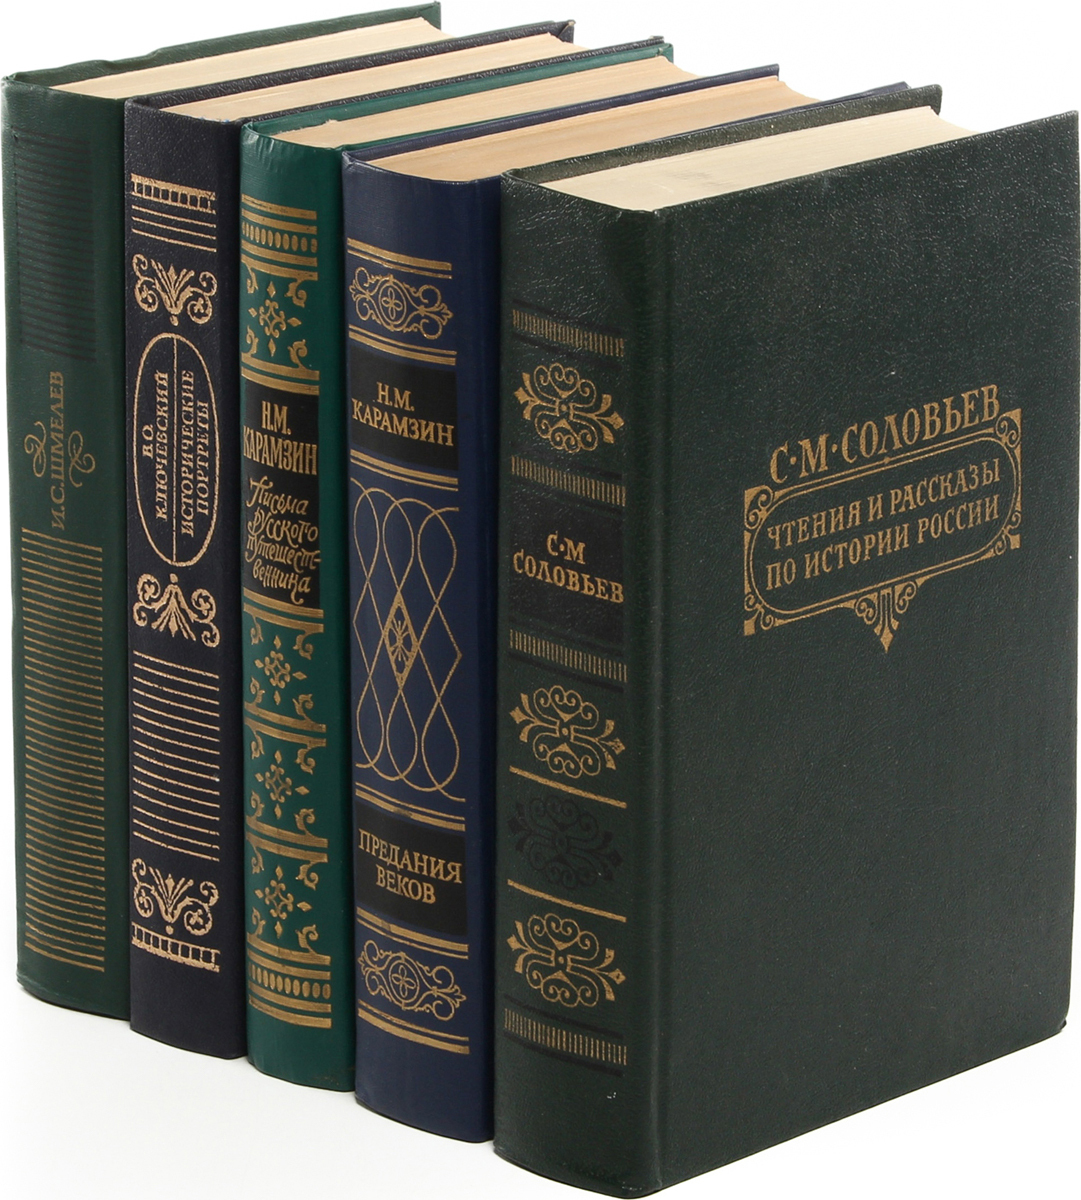 книги о исторических личностях связи